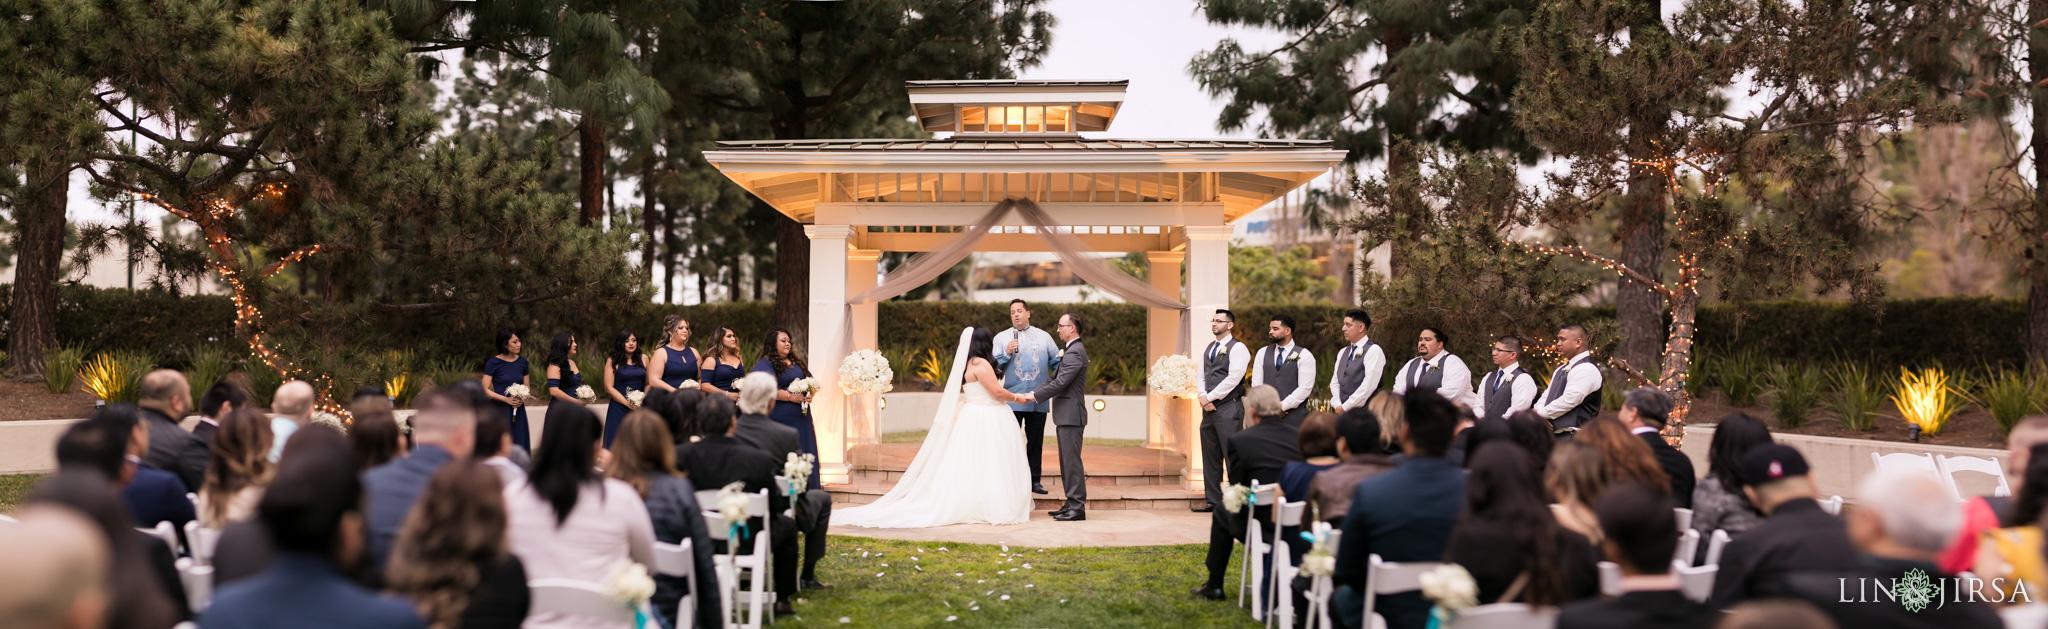 22 turnip rose promenade orange county wedding ceremony photography